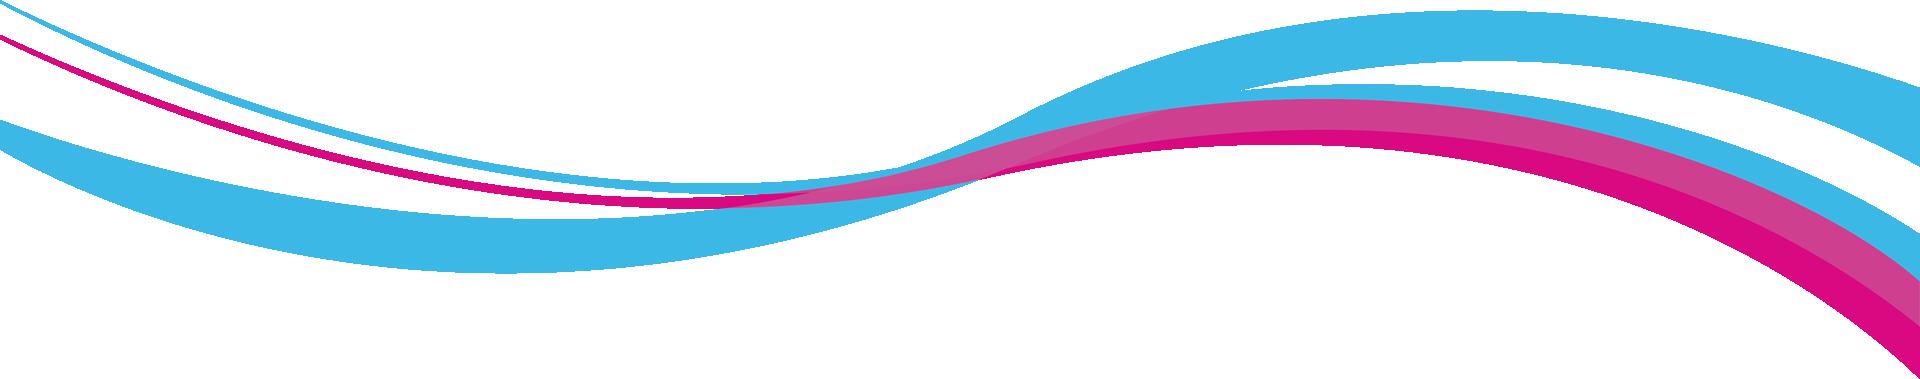 Formas curvas png 4 » PNG Image.